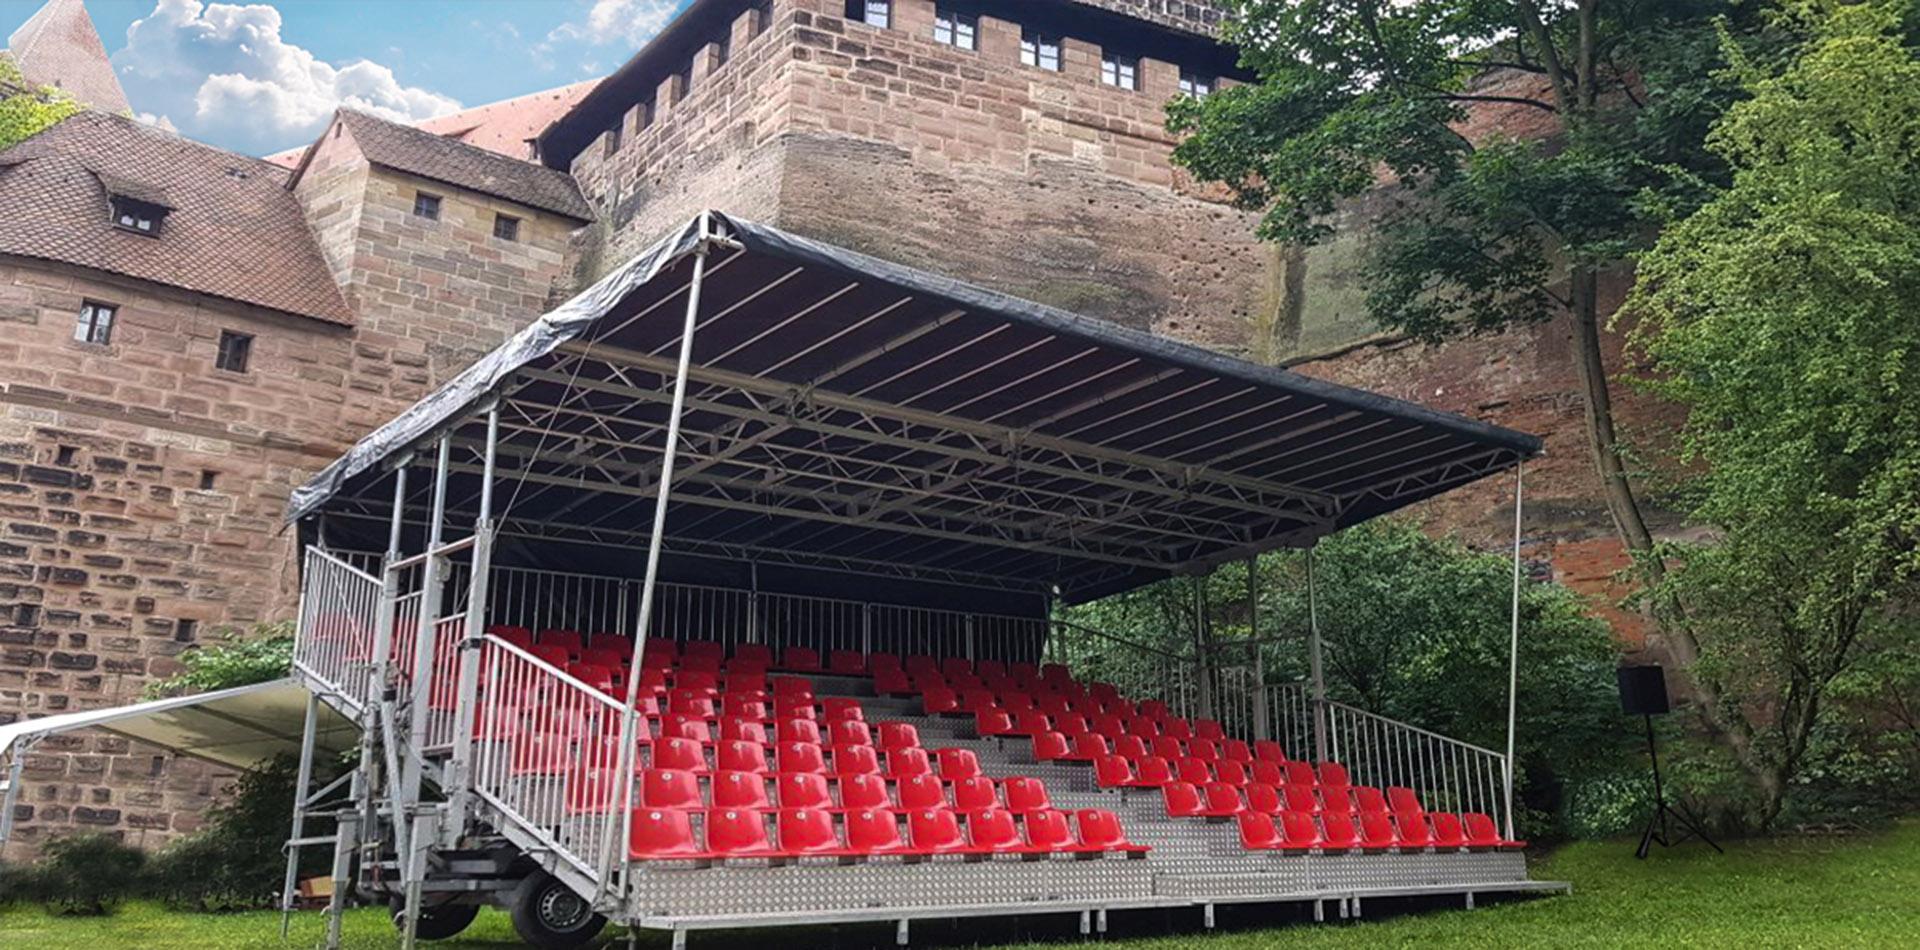 bauer_stagemobil-stand-122_burg_mobile-tribuene